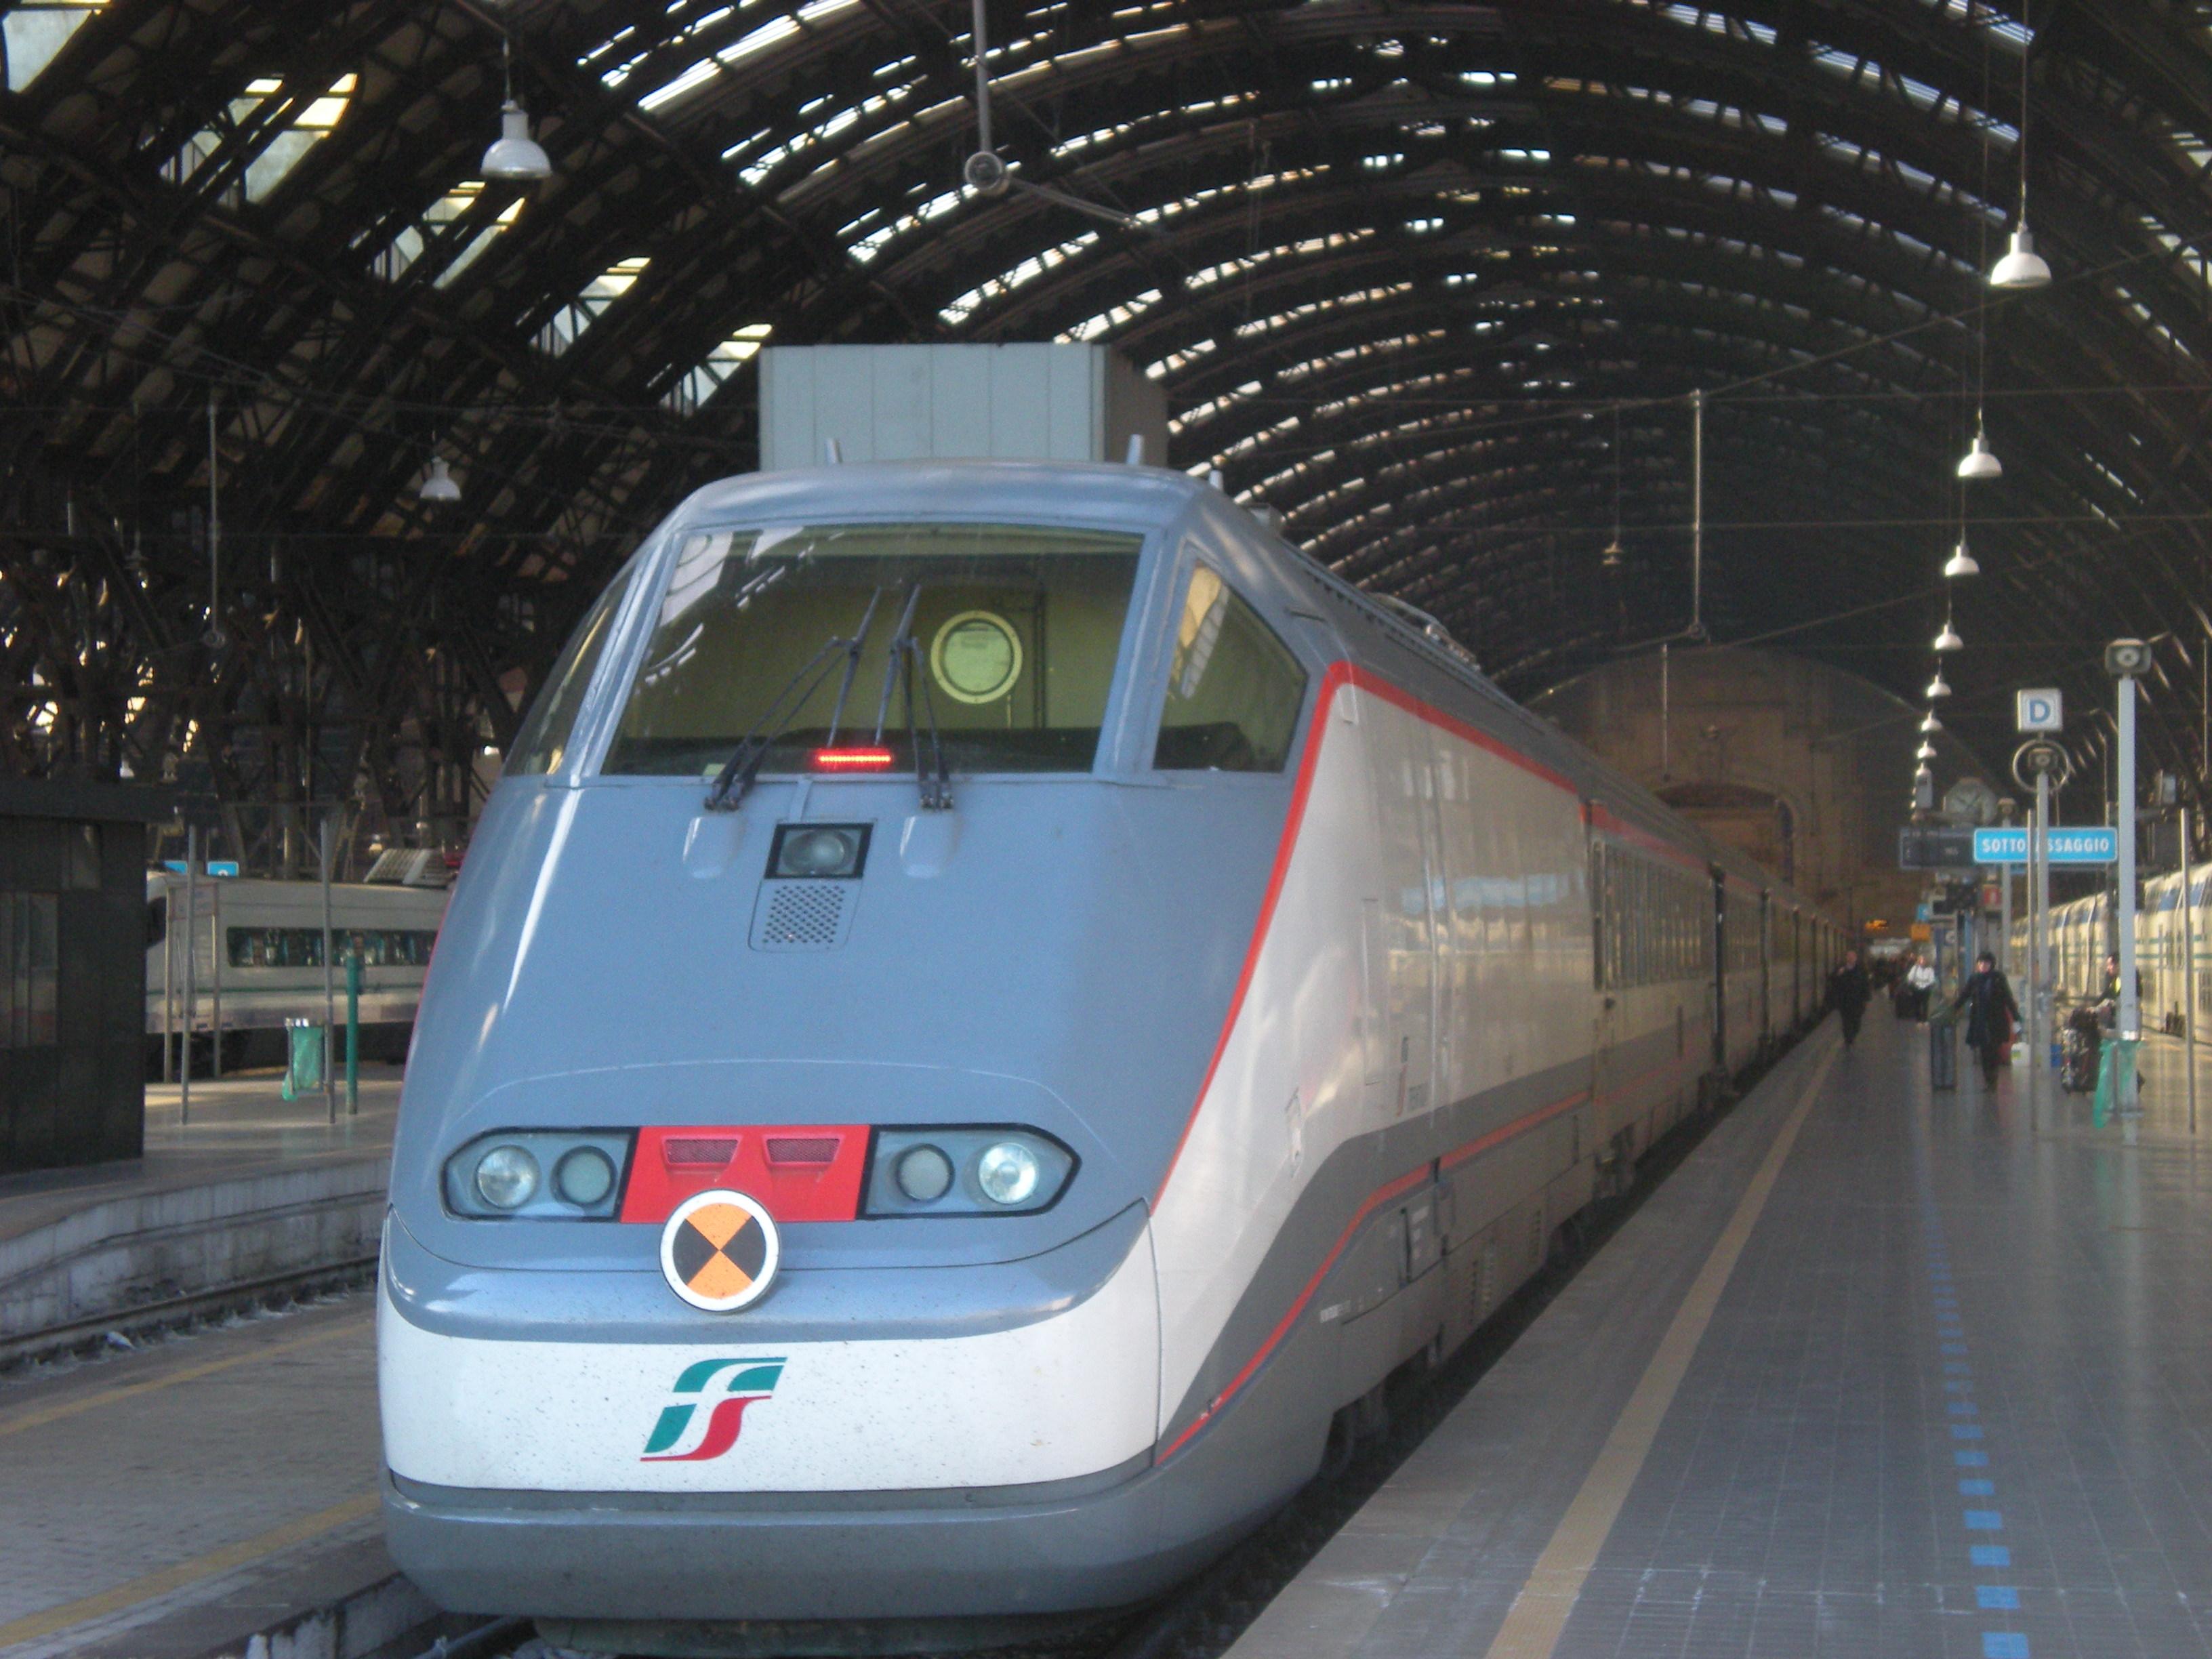 Italian High-Speed Train